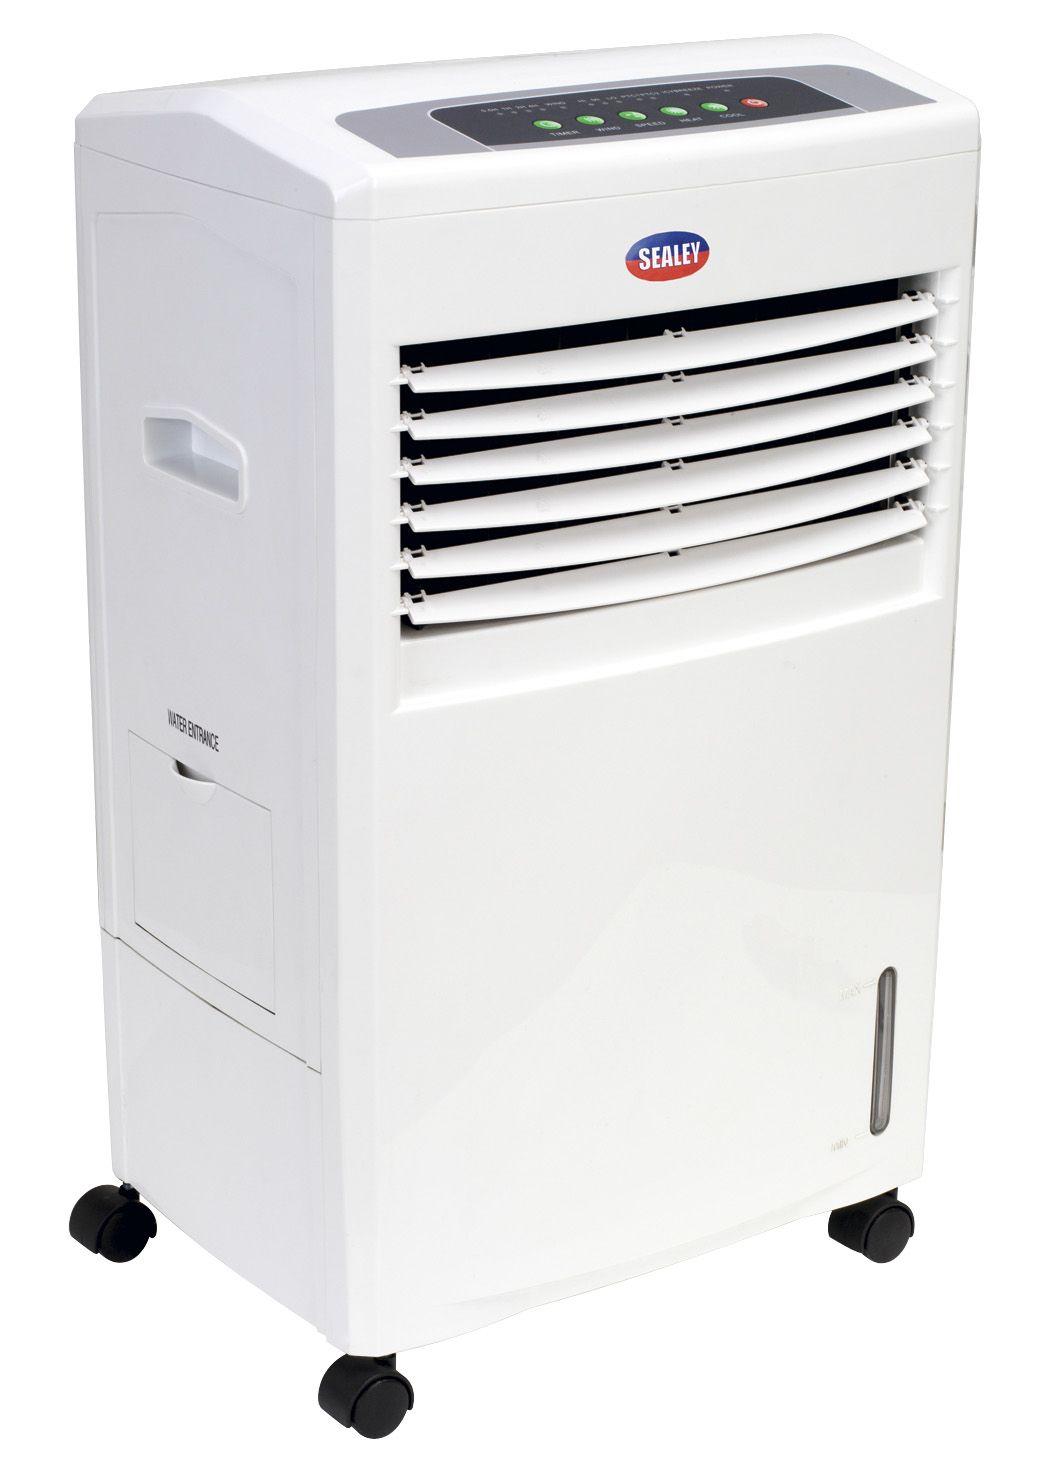 Sealey Air Cooler/Heater/Air Purifier/Humidifier